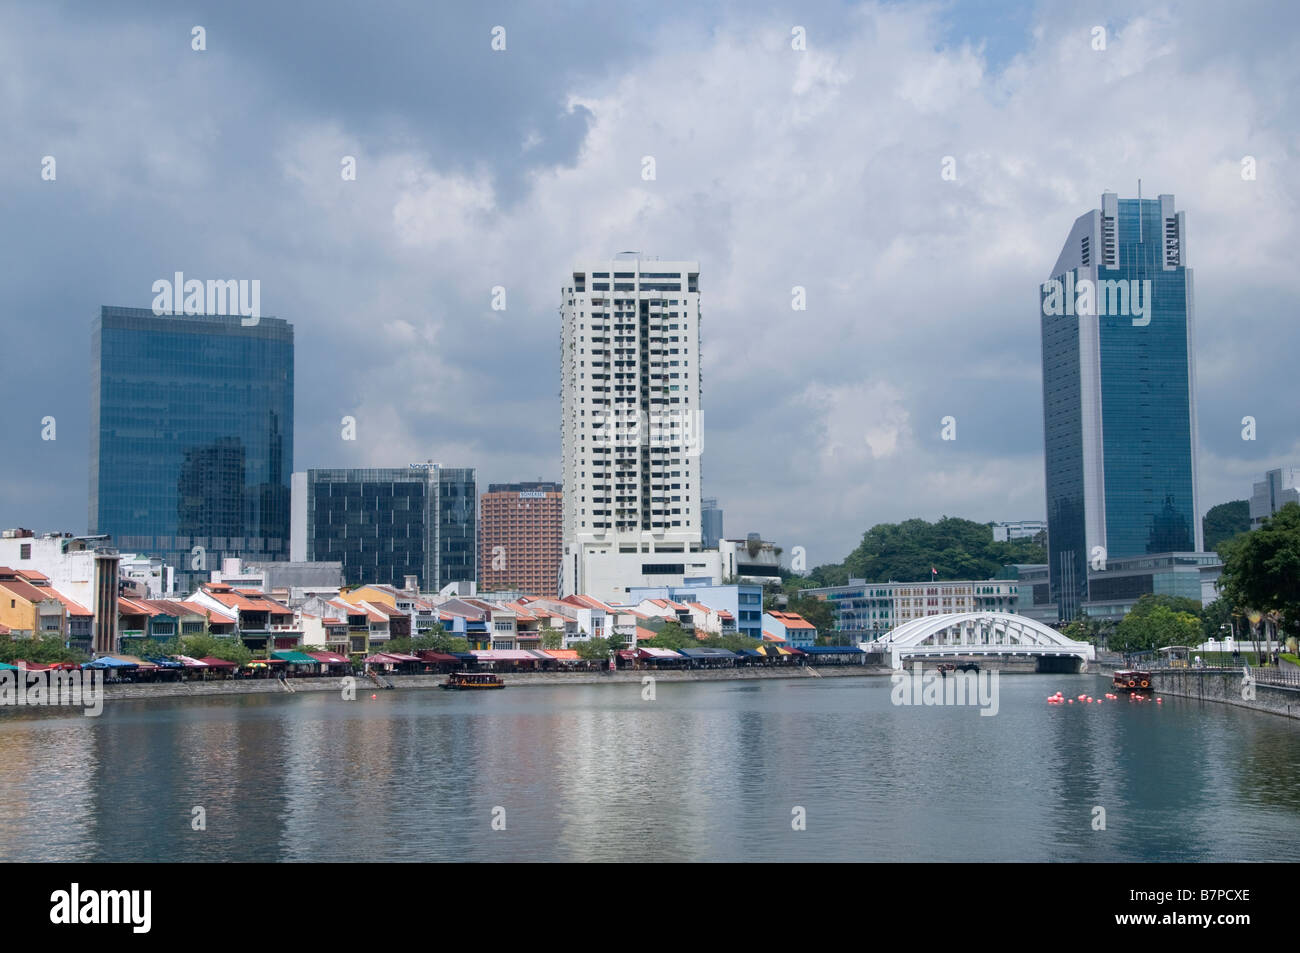 Singapore river boat quay - Stock Image